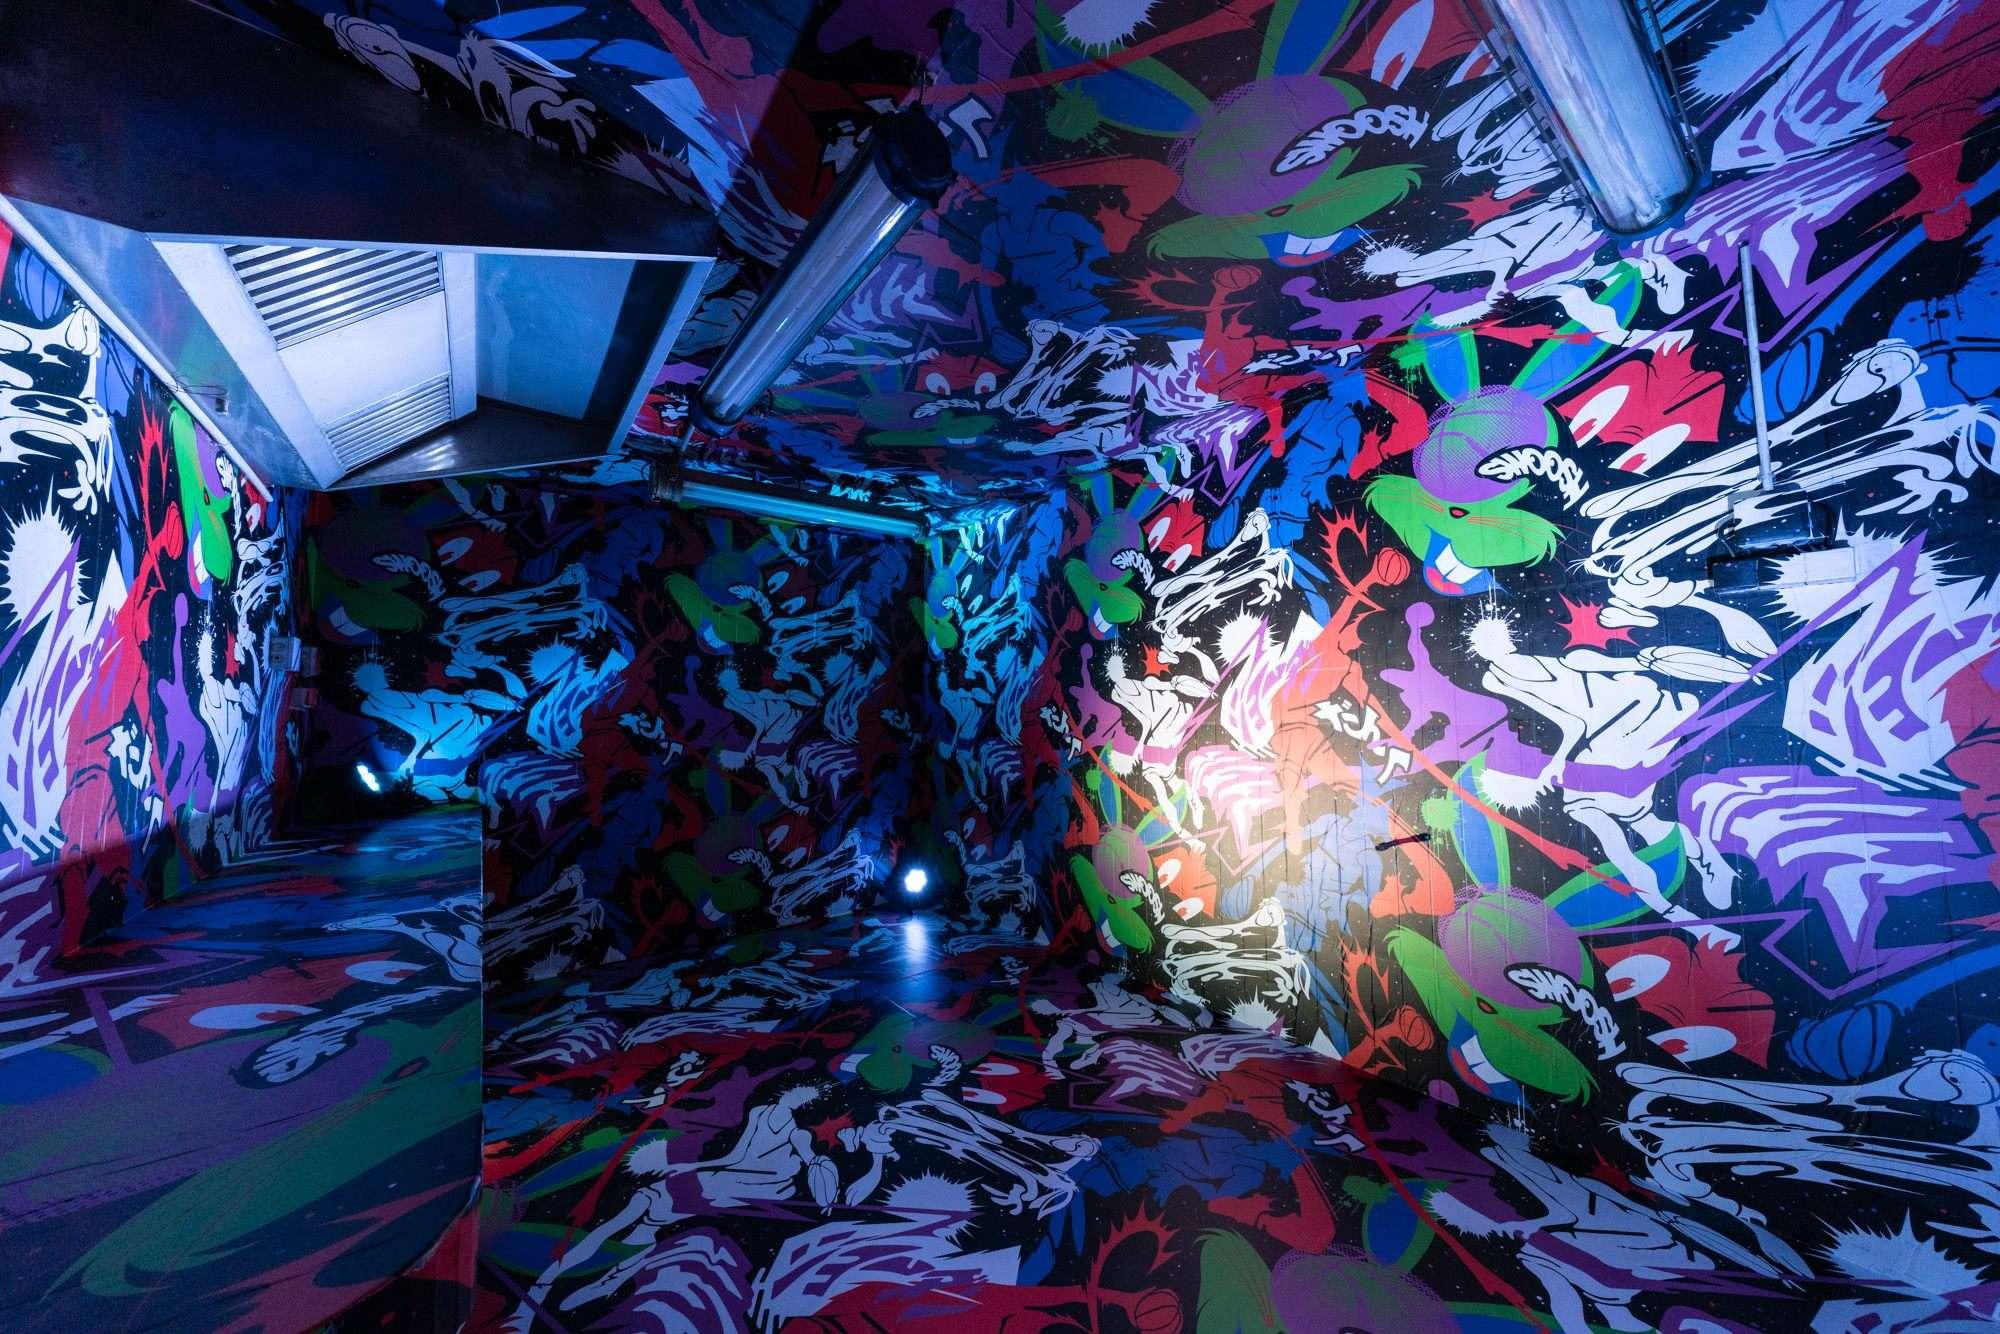 sato-creative-studio-paris-fantasista-utamaro-trajectoire-studio-installation-all-over-print